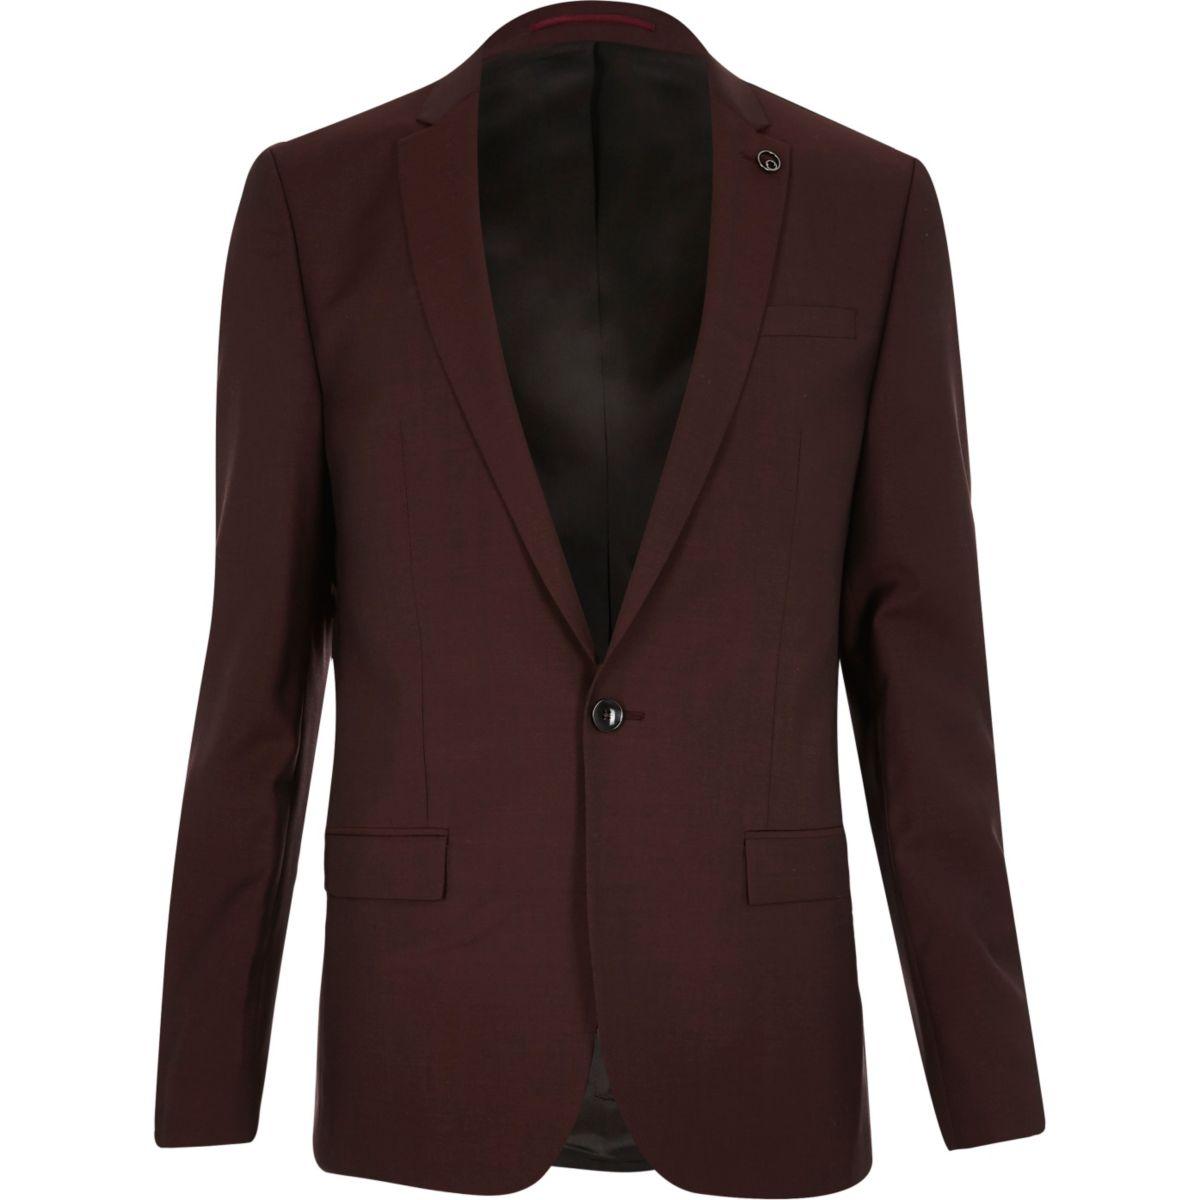 Berry skinny suit jacket